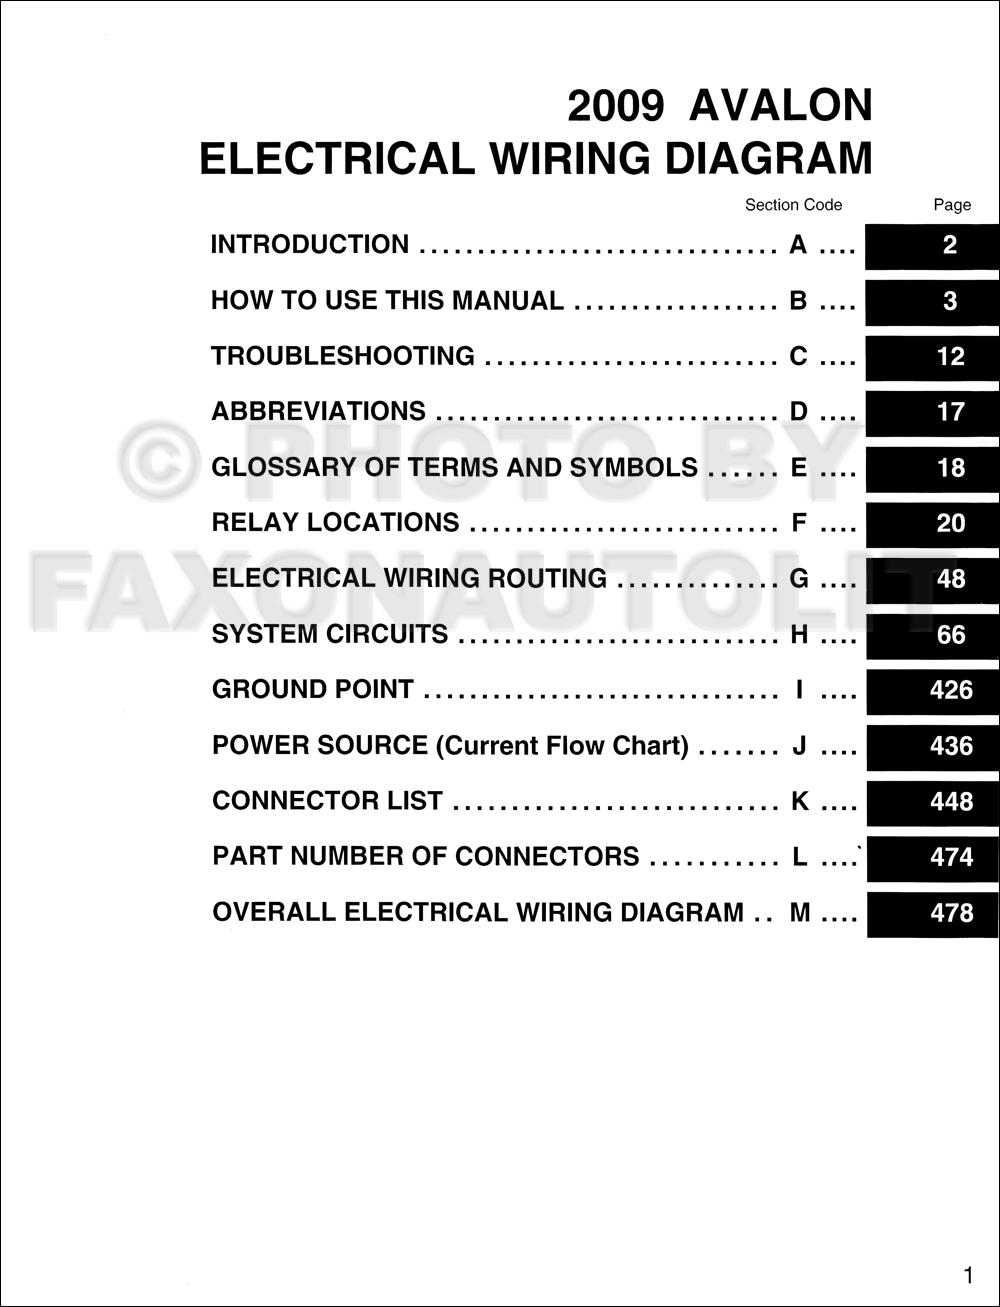 2001 Toyota Avalon Wiring Diagram Manual Original